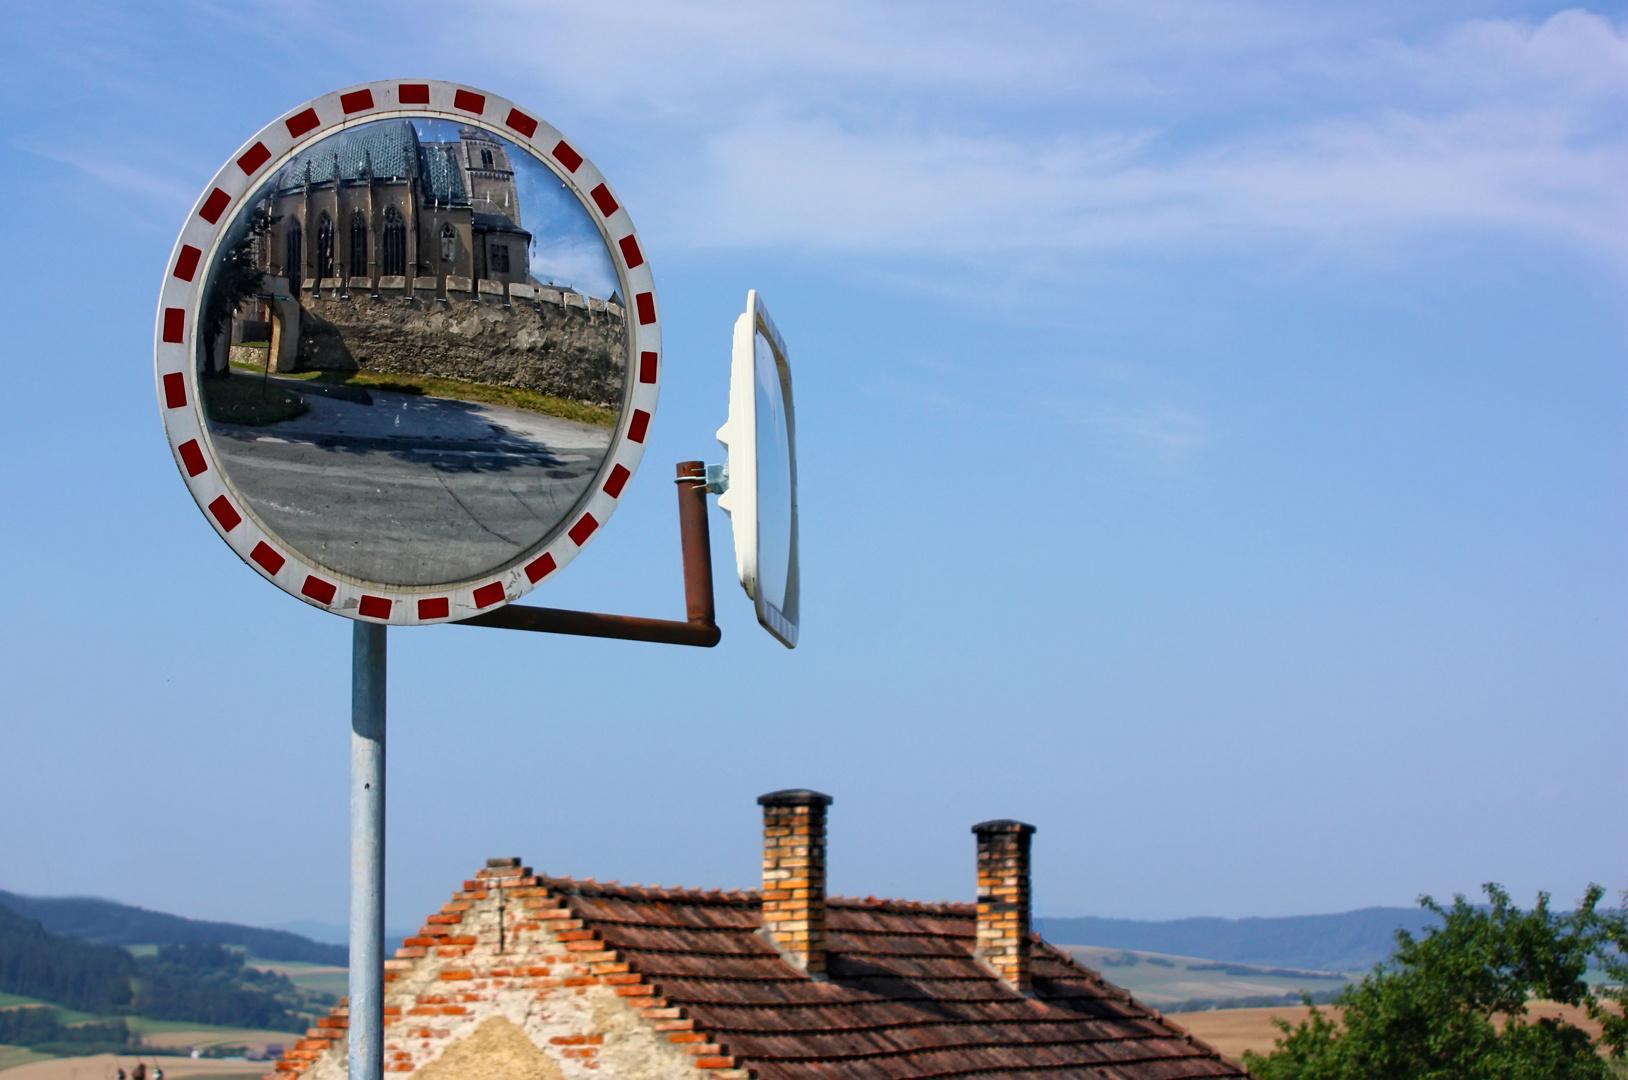 Church reflected in traffic mirror